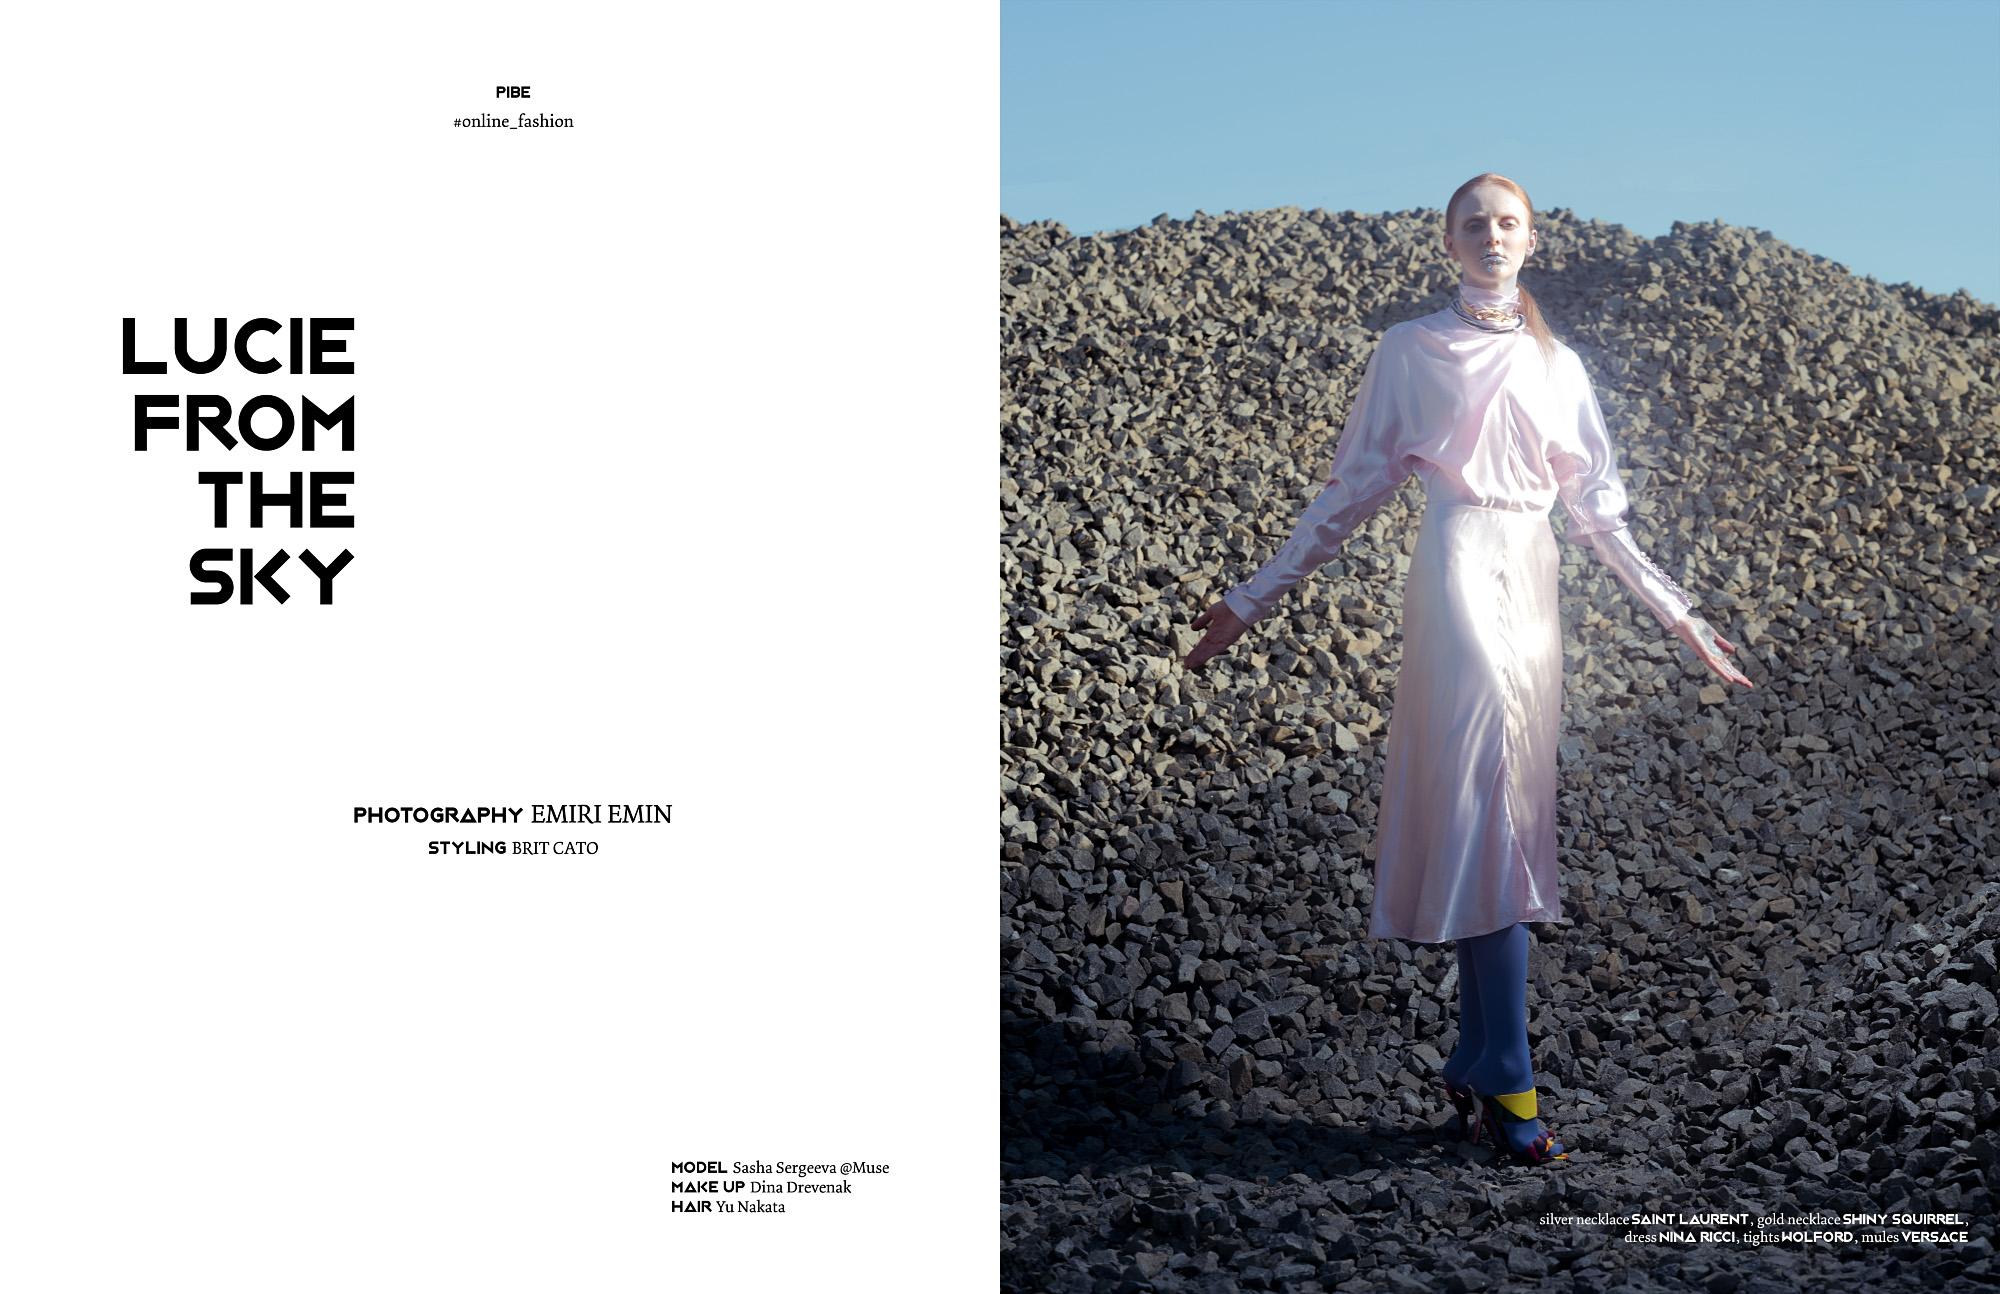 PIBE Magazine Saint Laurent Nina Ricci Wolford Versace.jpg